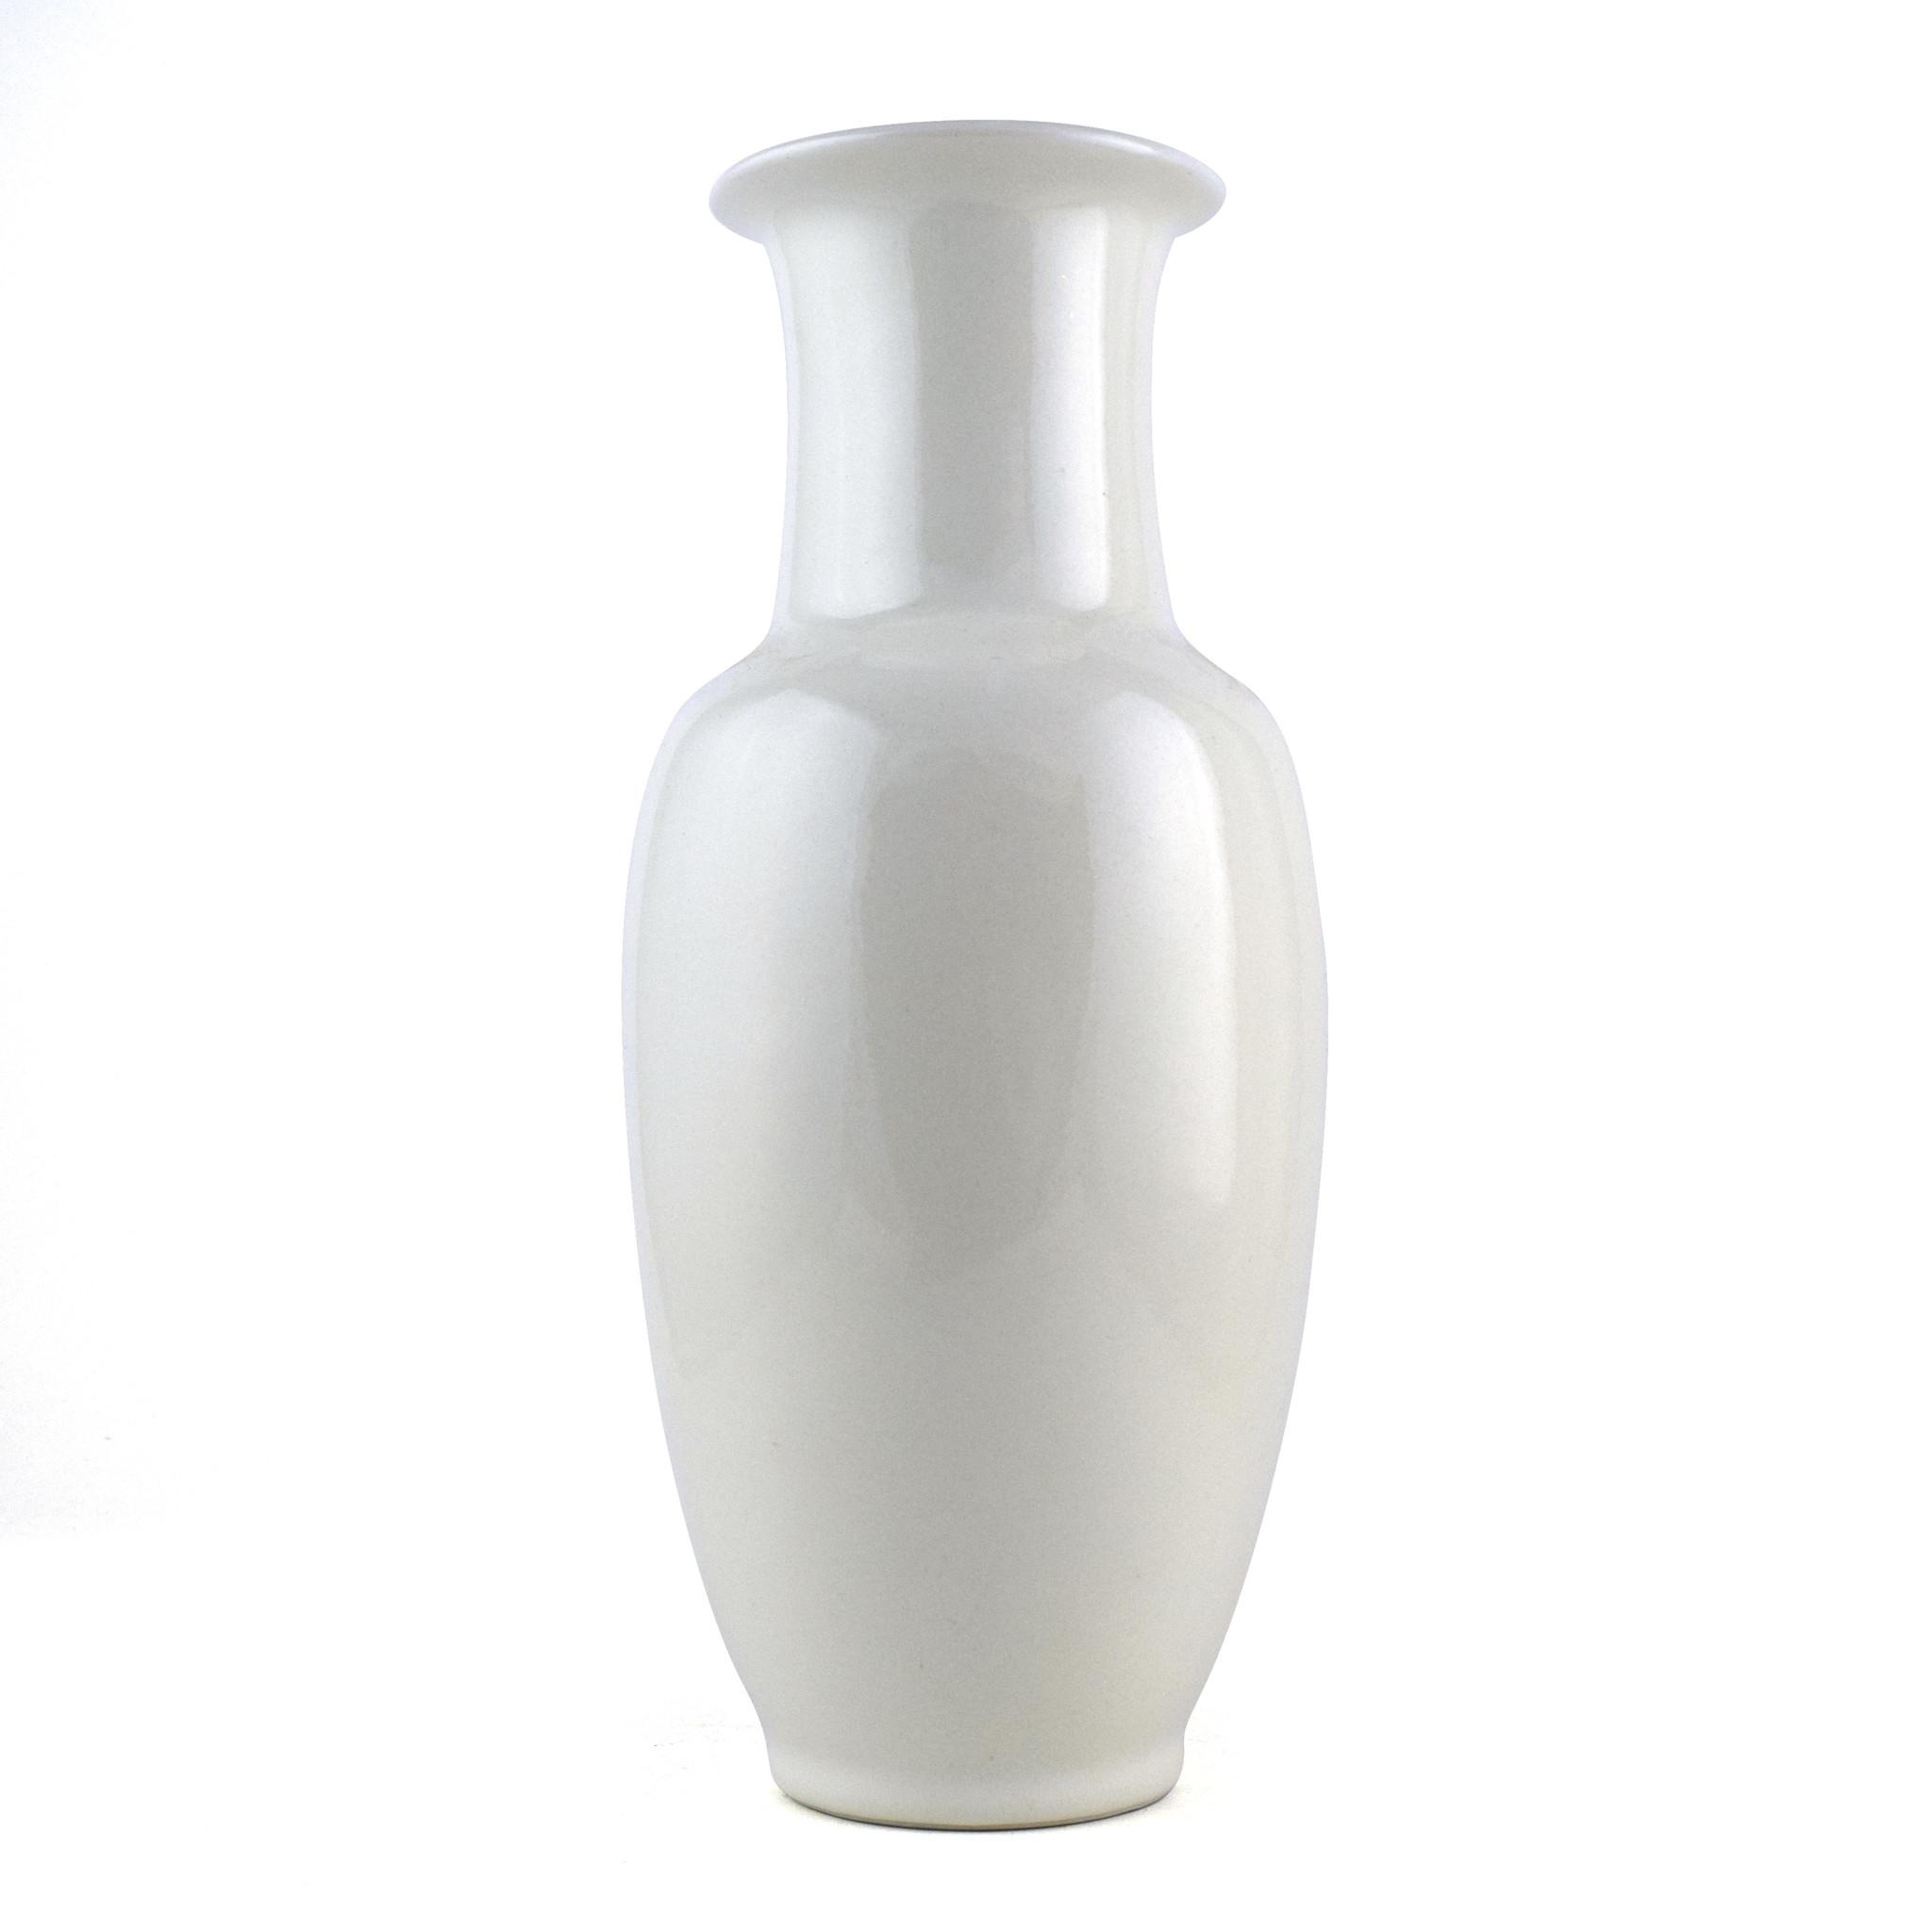 Medalta Reproduction Vase